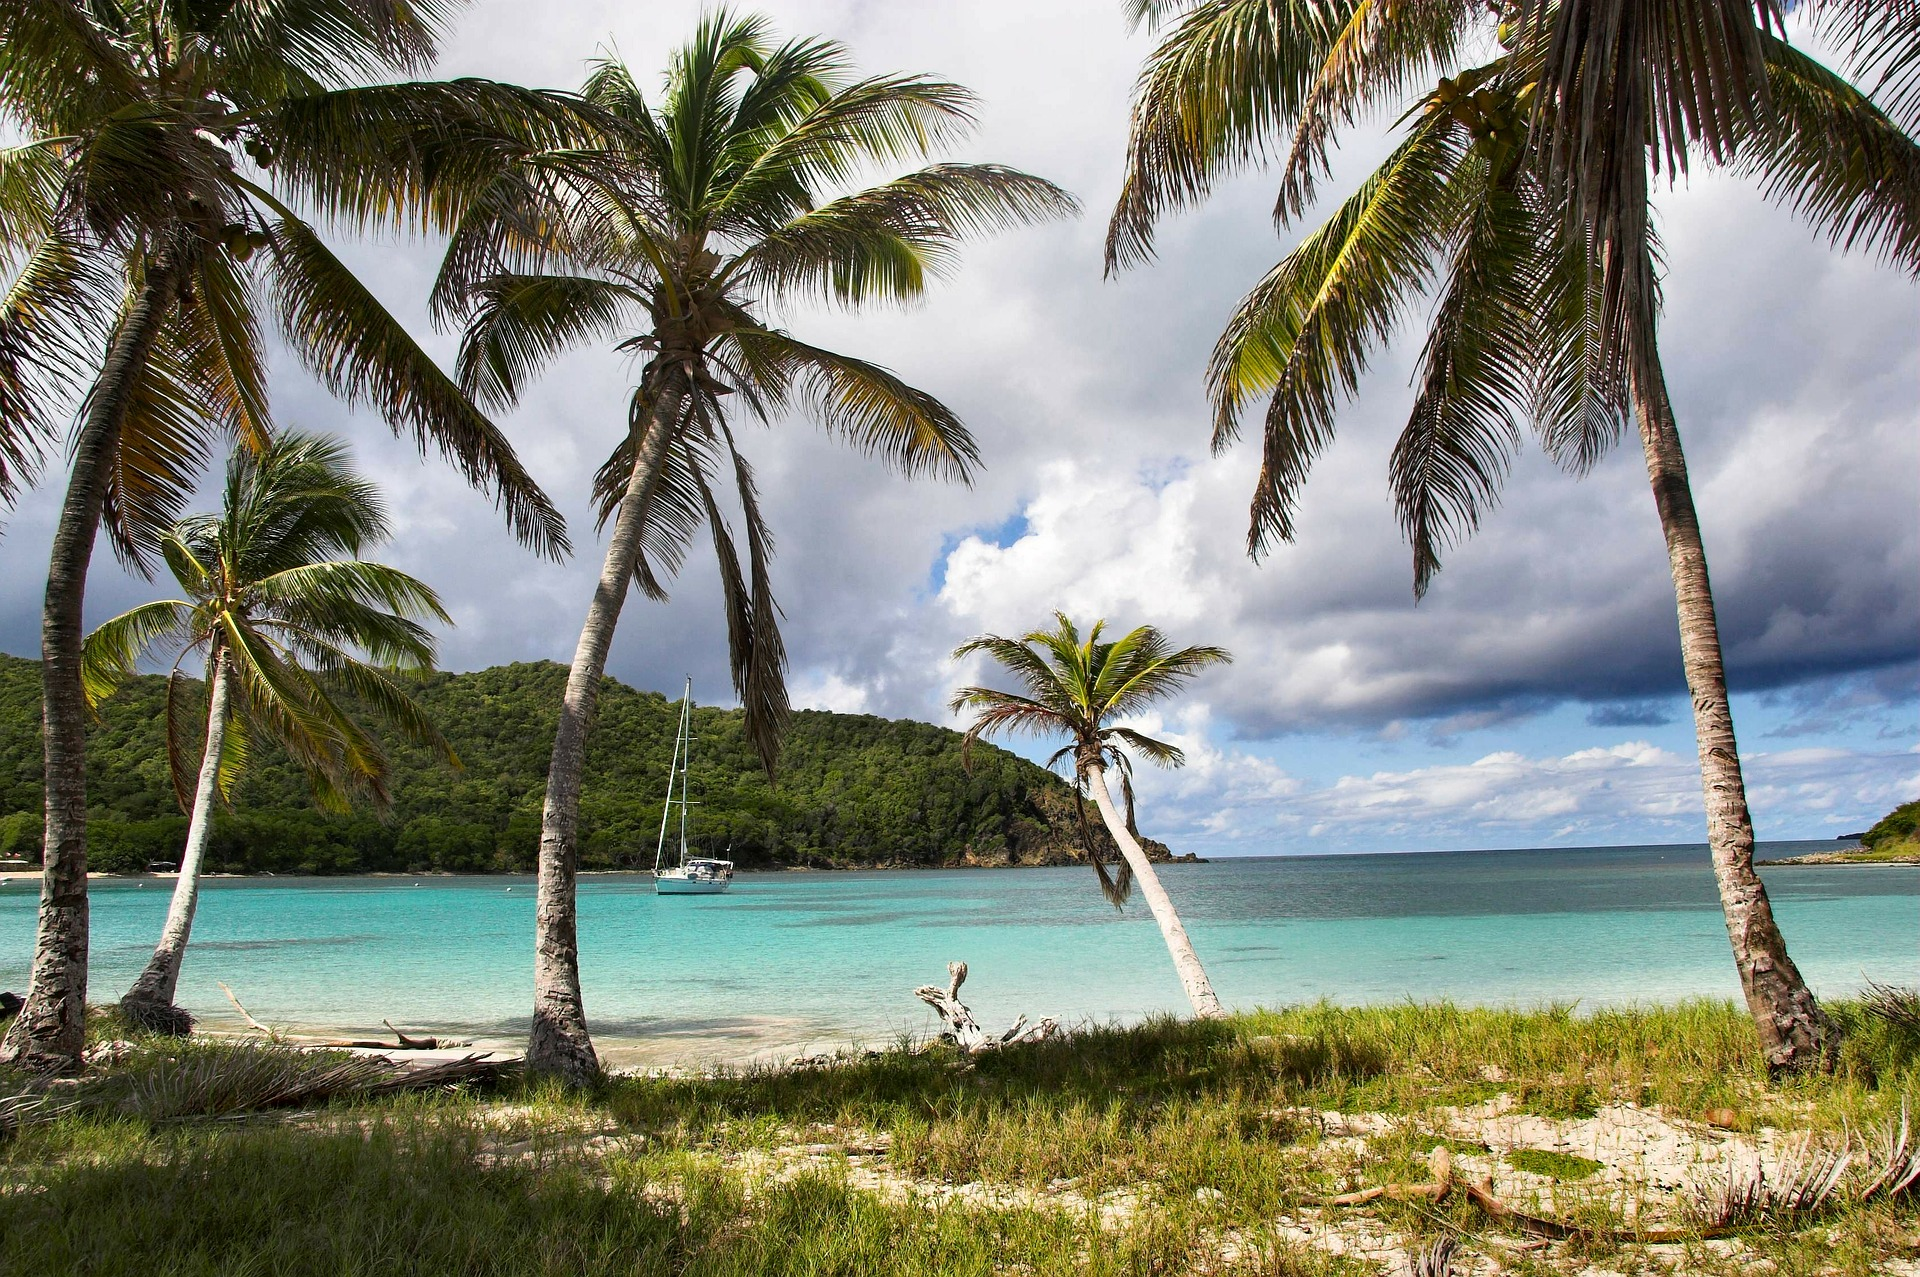 St. Vincent & The Grenadines honeymoon destination